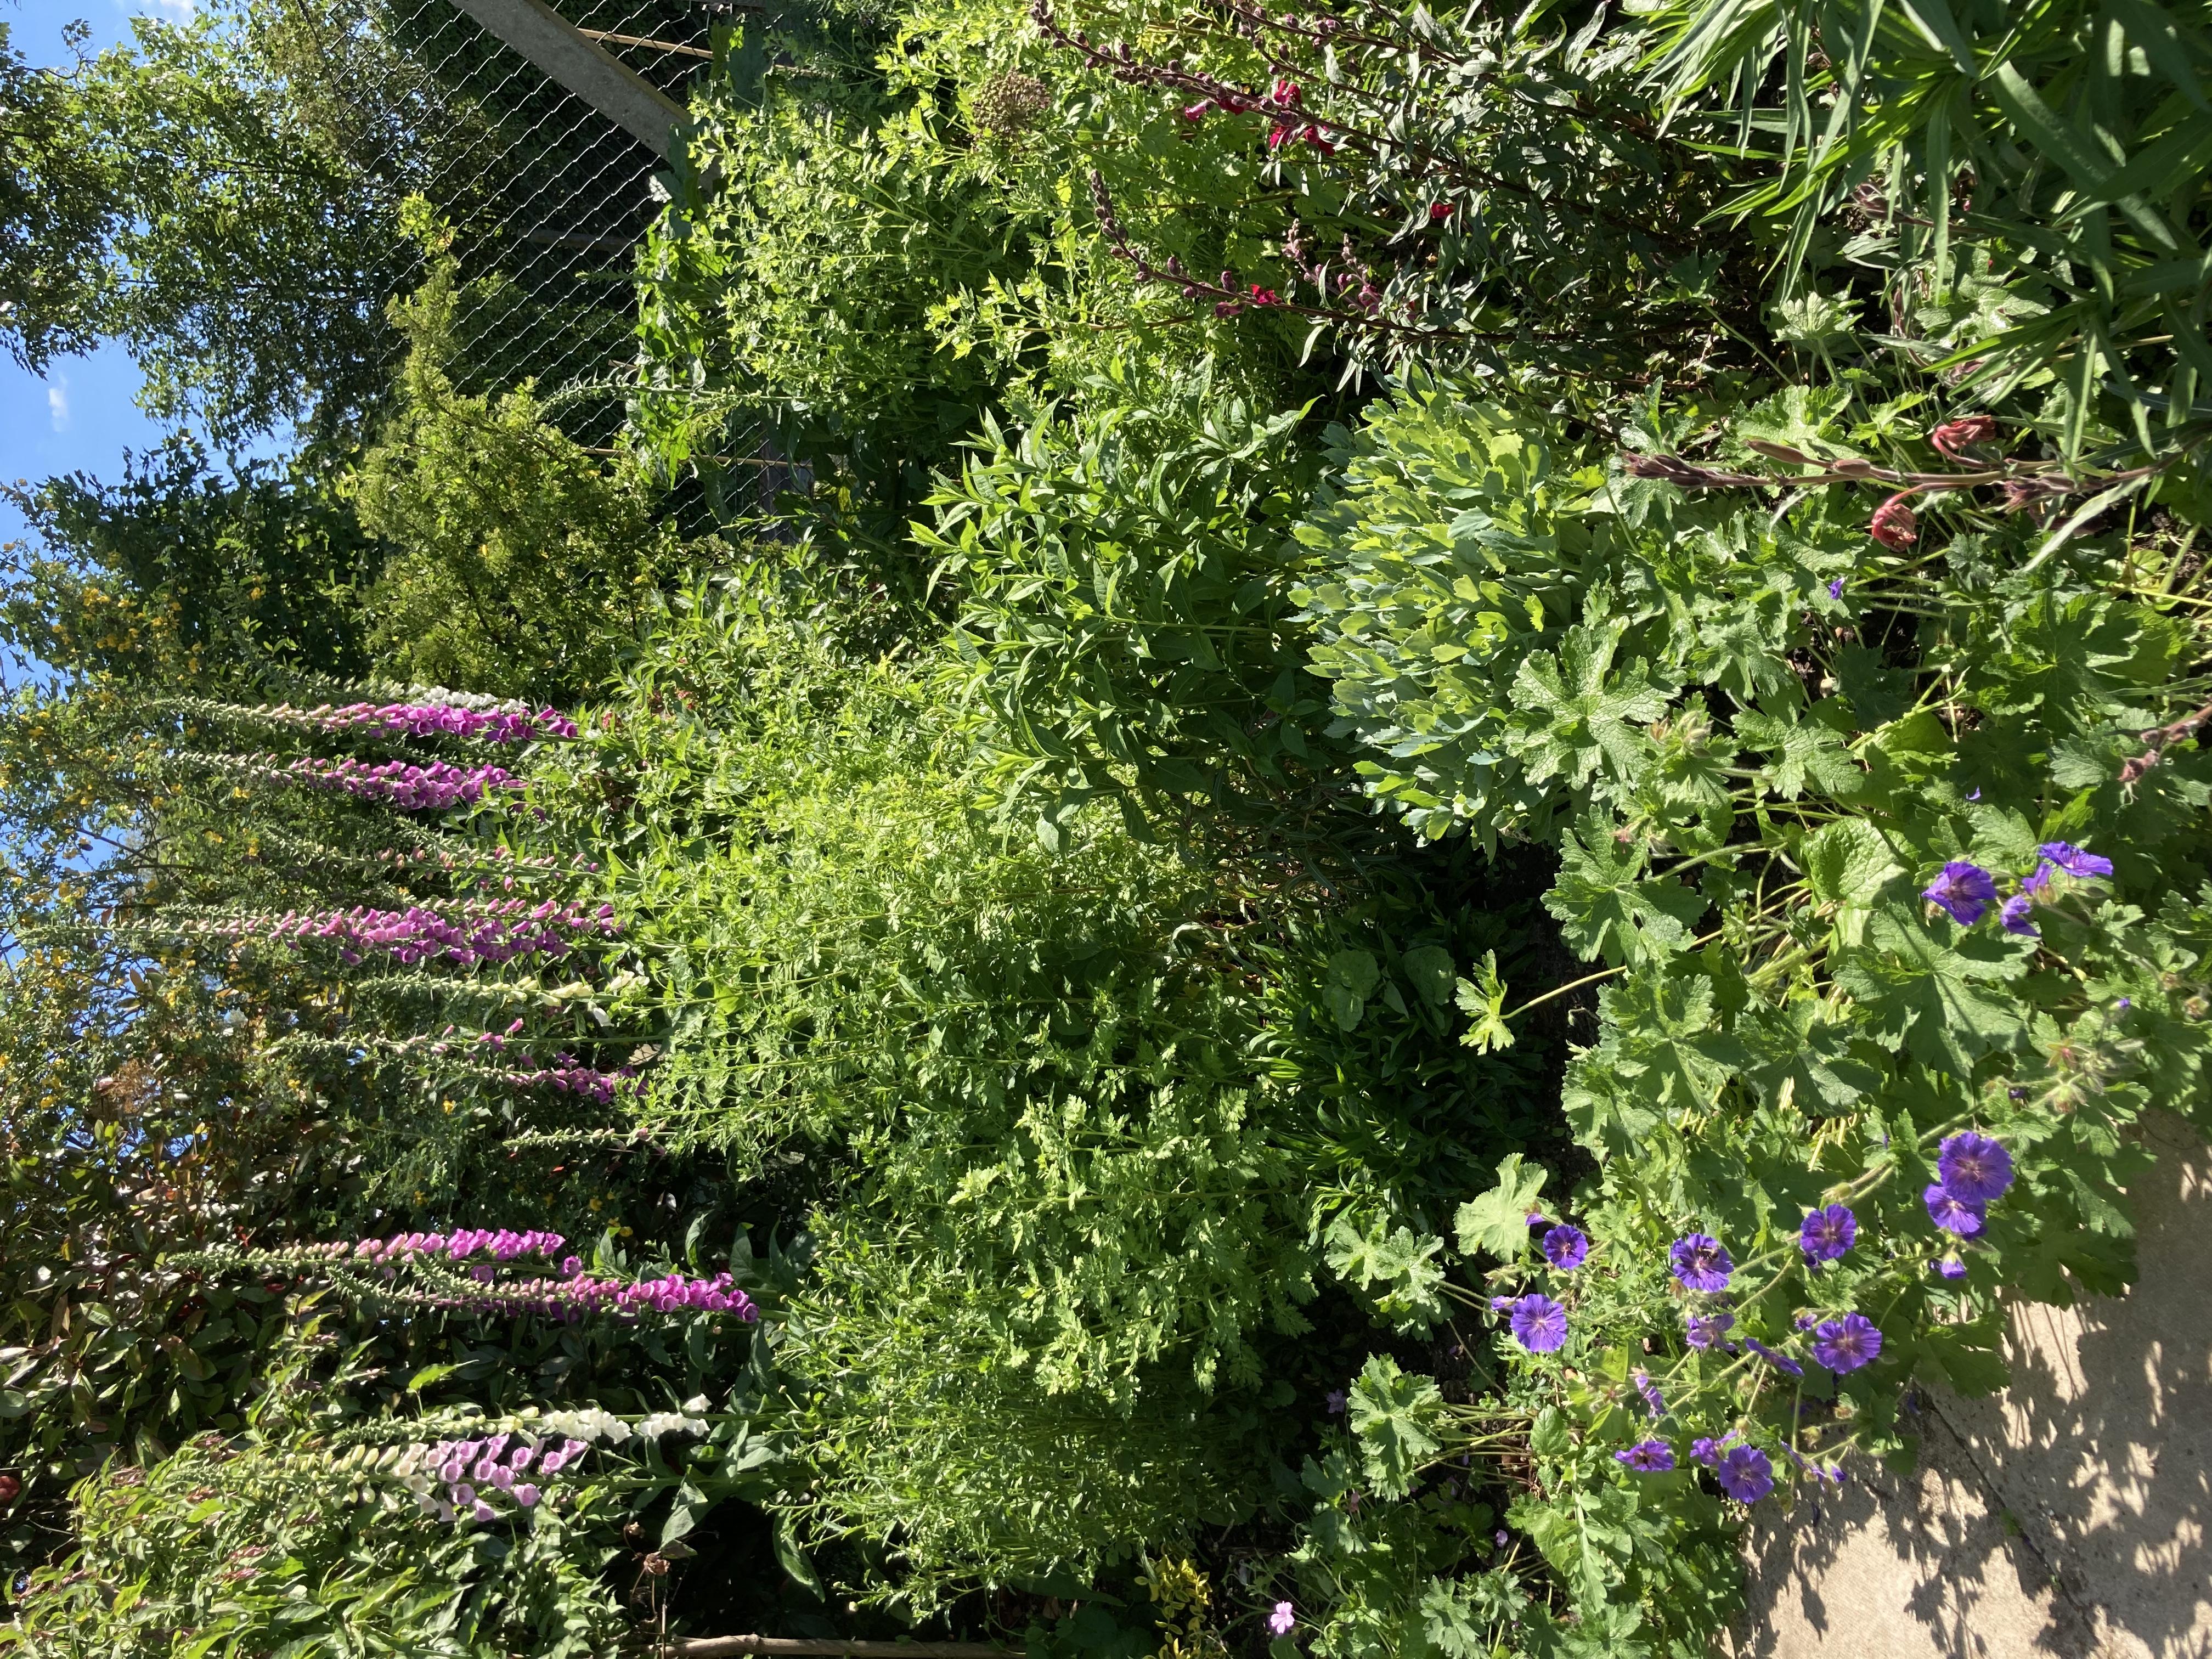 Our Bee friendly garden